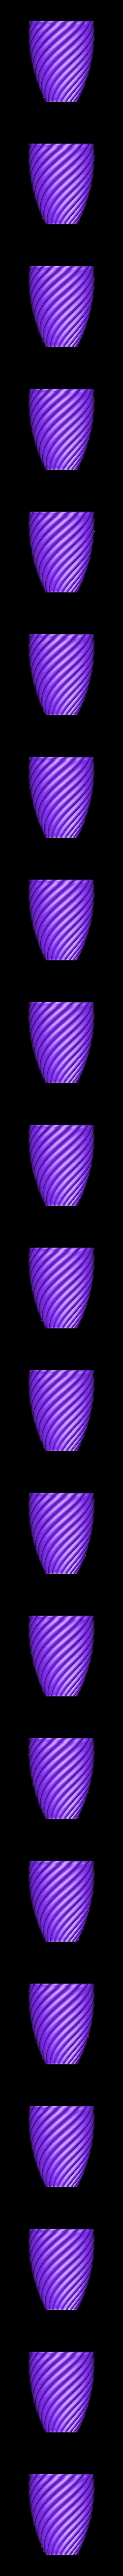 Lamp1.STL Download free STL file Rotation folded lamp shade • Design to 3D print, MaterialsToBuils3D